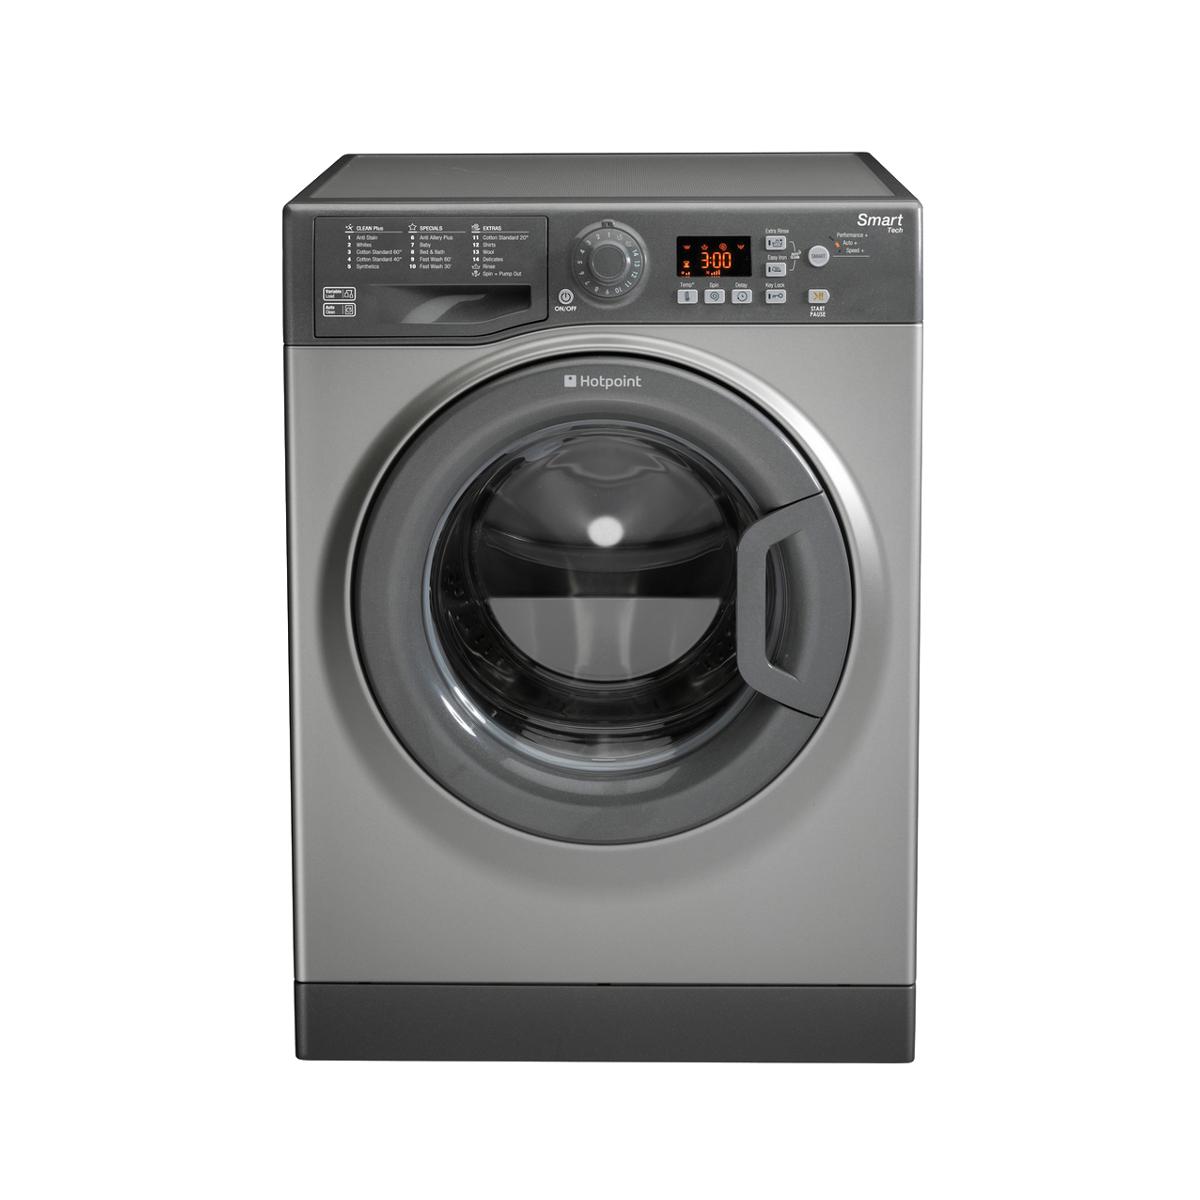 Hotpoint Wmbf742g Freestanding Washing Machine 16